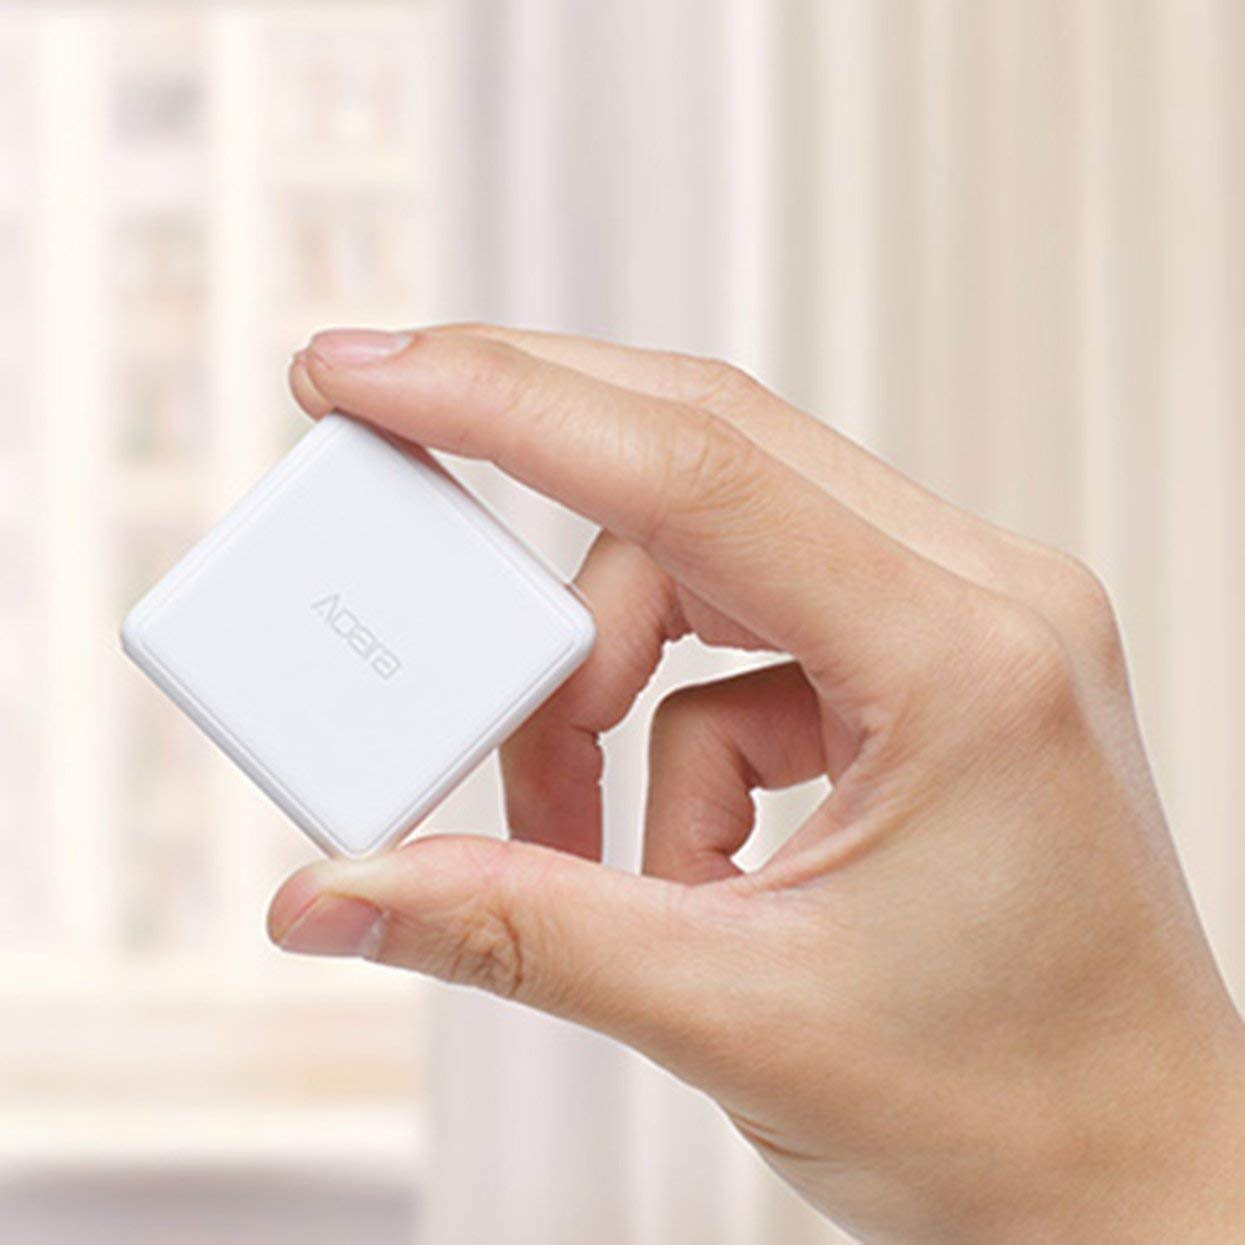 Tree-on-Life Contr/ôleur Magic Cube Version Zigbee Six Actions Contr/ôle pour Dispositif Smart Home Travailler avec Mijia Home App pour Xiaomi Mi Aqara